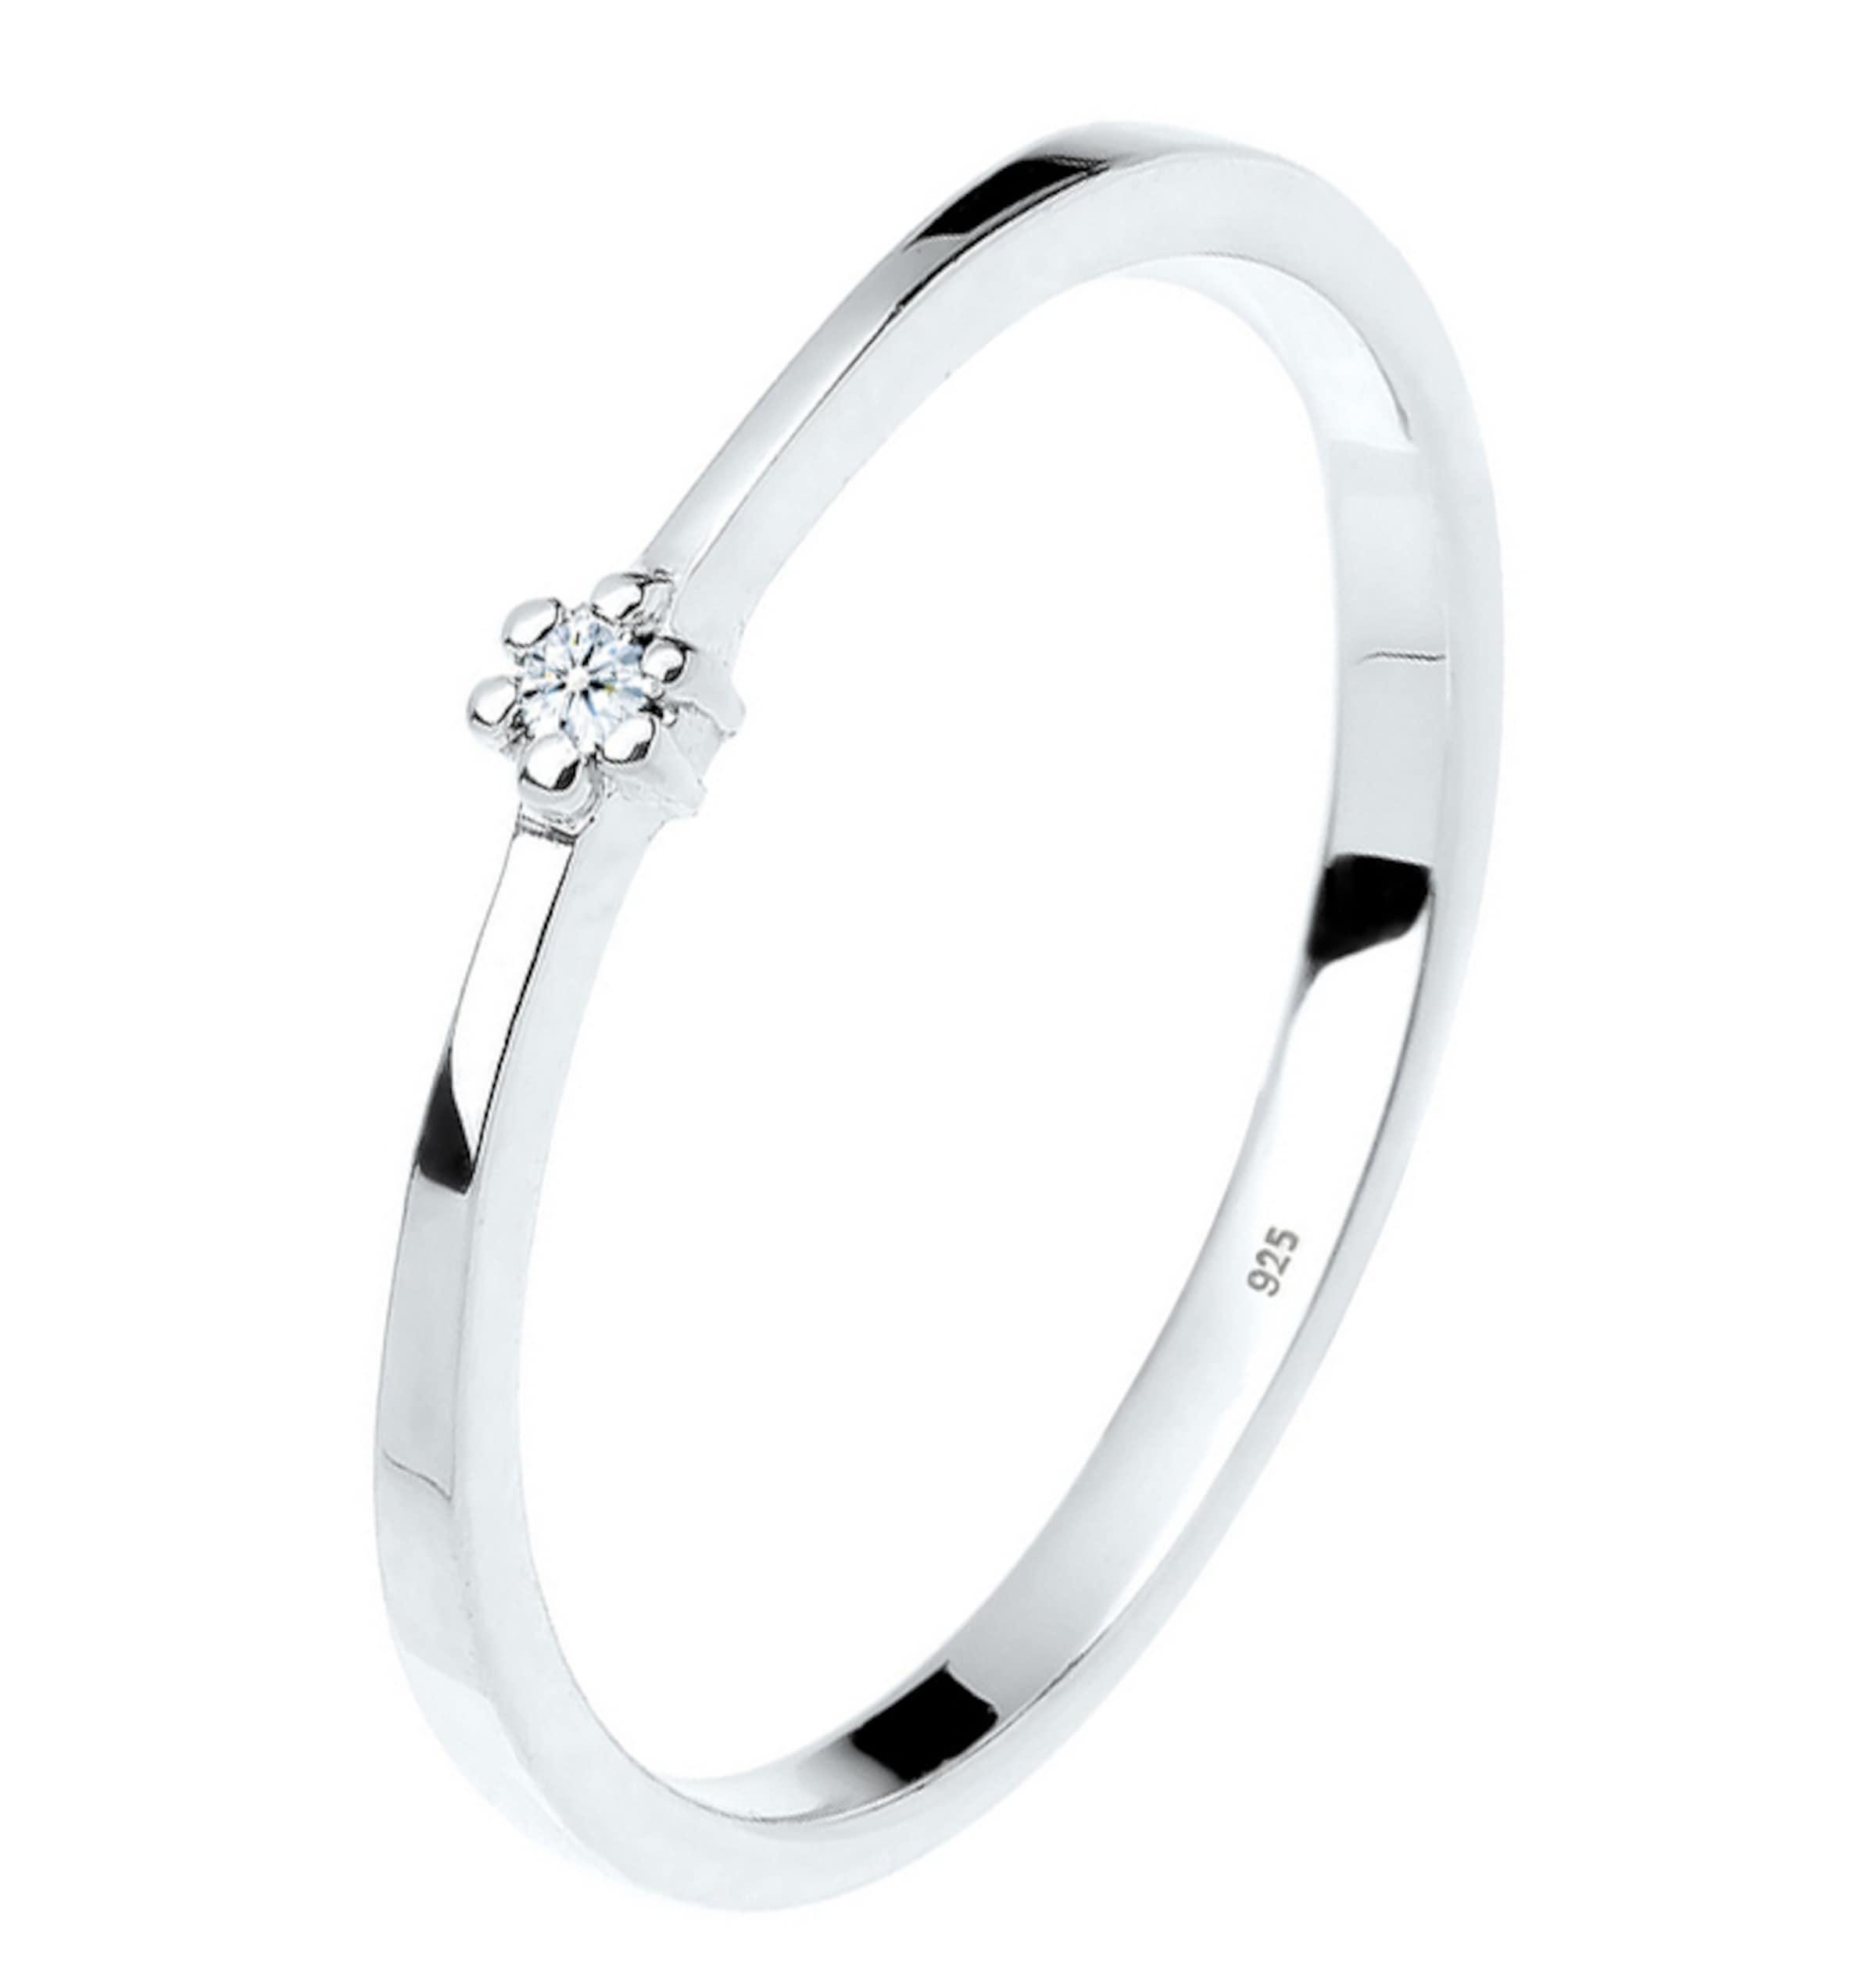 In 'nora0604541213' Diamore Ring Silber Ring 'nora0604541213' In Diamore Ring Diamore 'nora0604541213' In Silber sQrtCdh